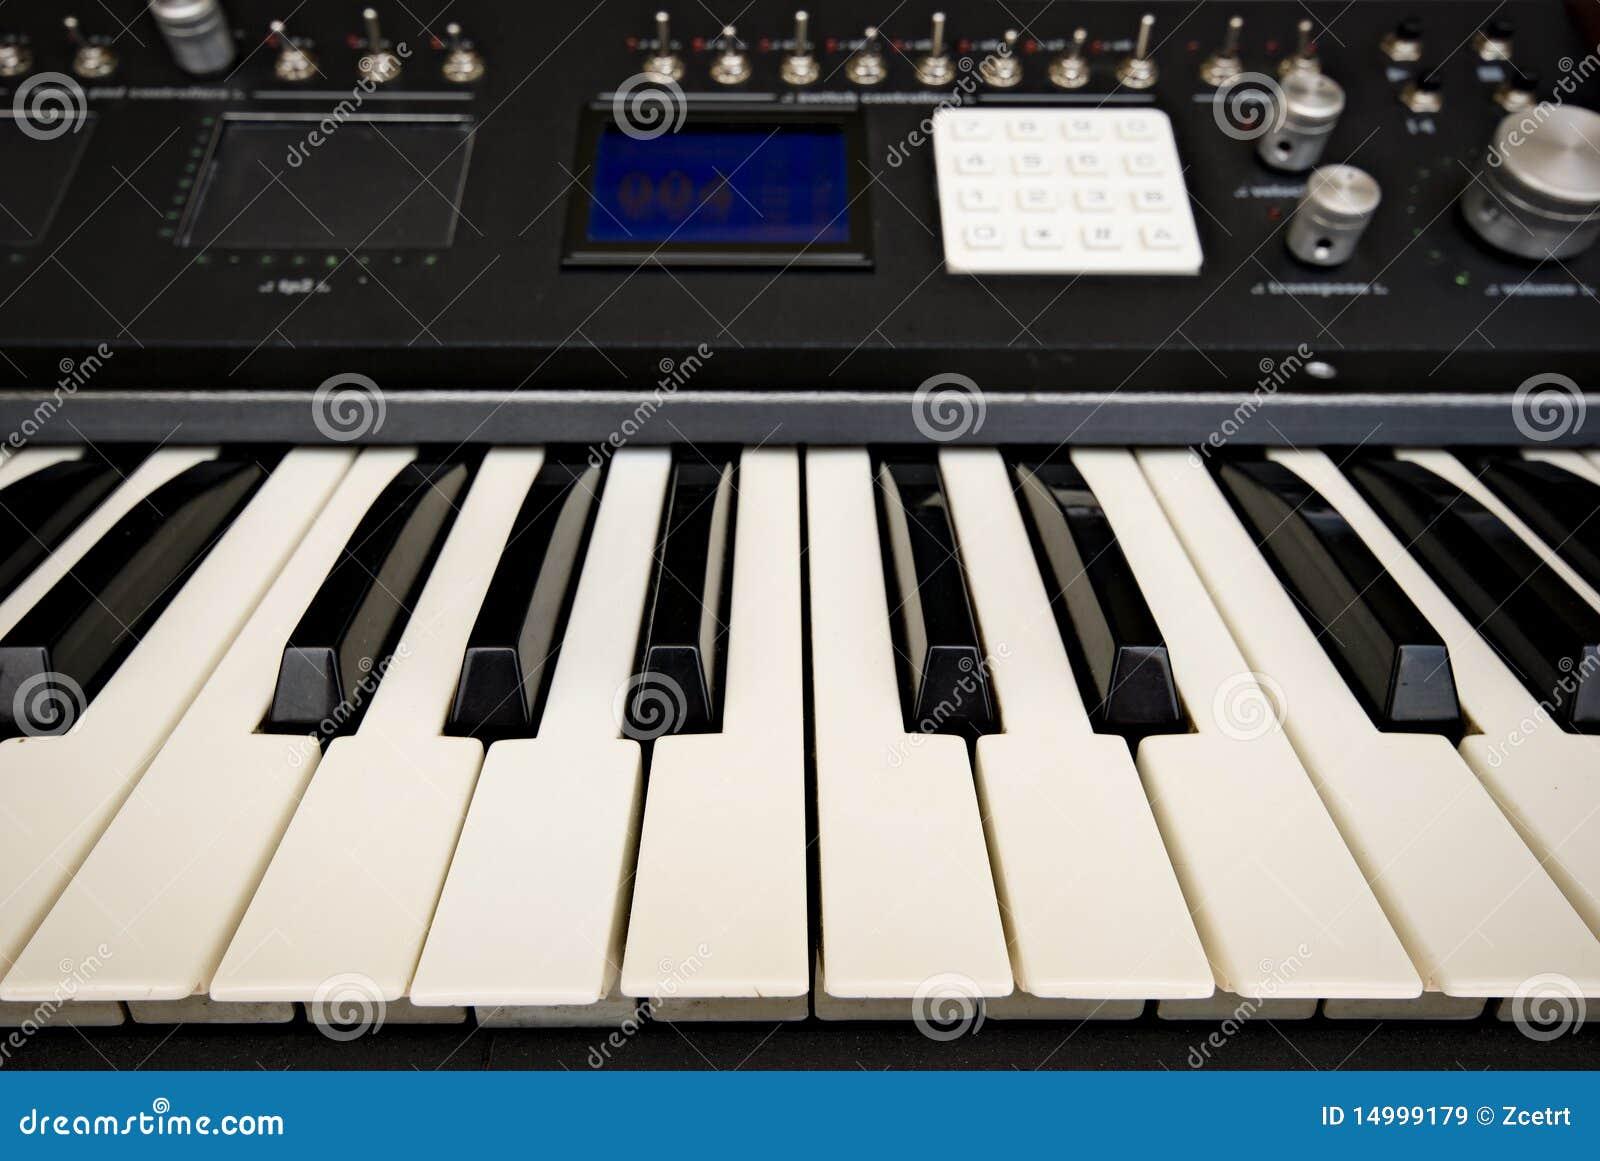 Geavanceerde synthesizer